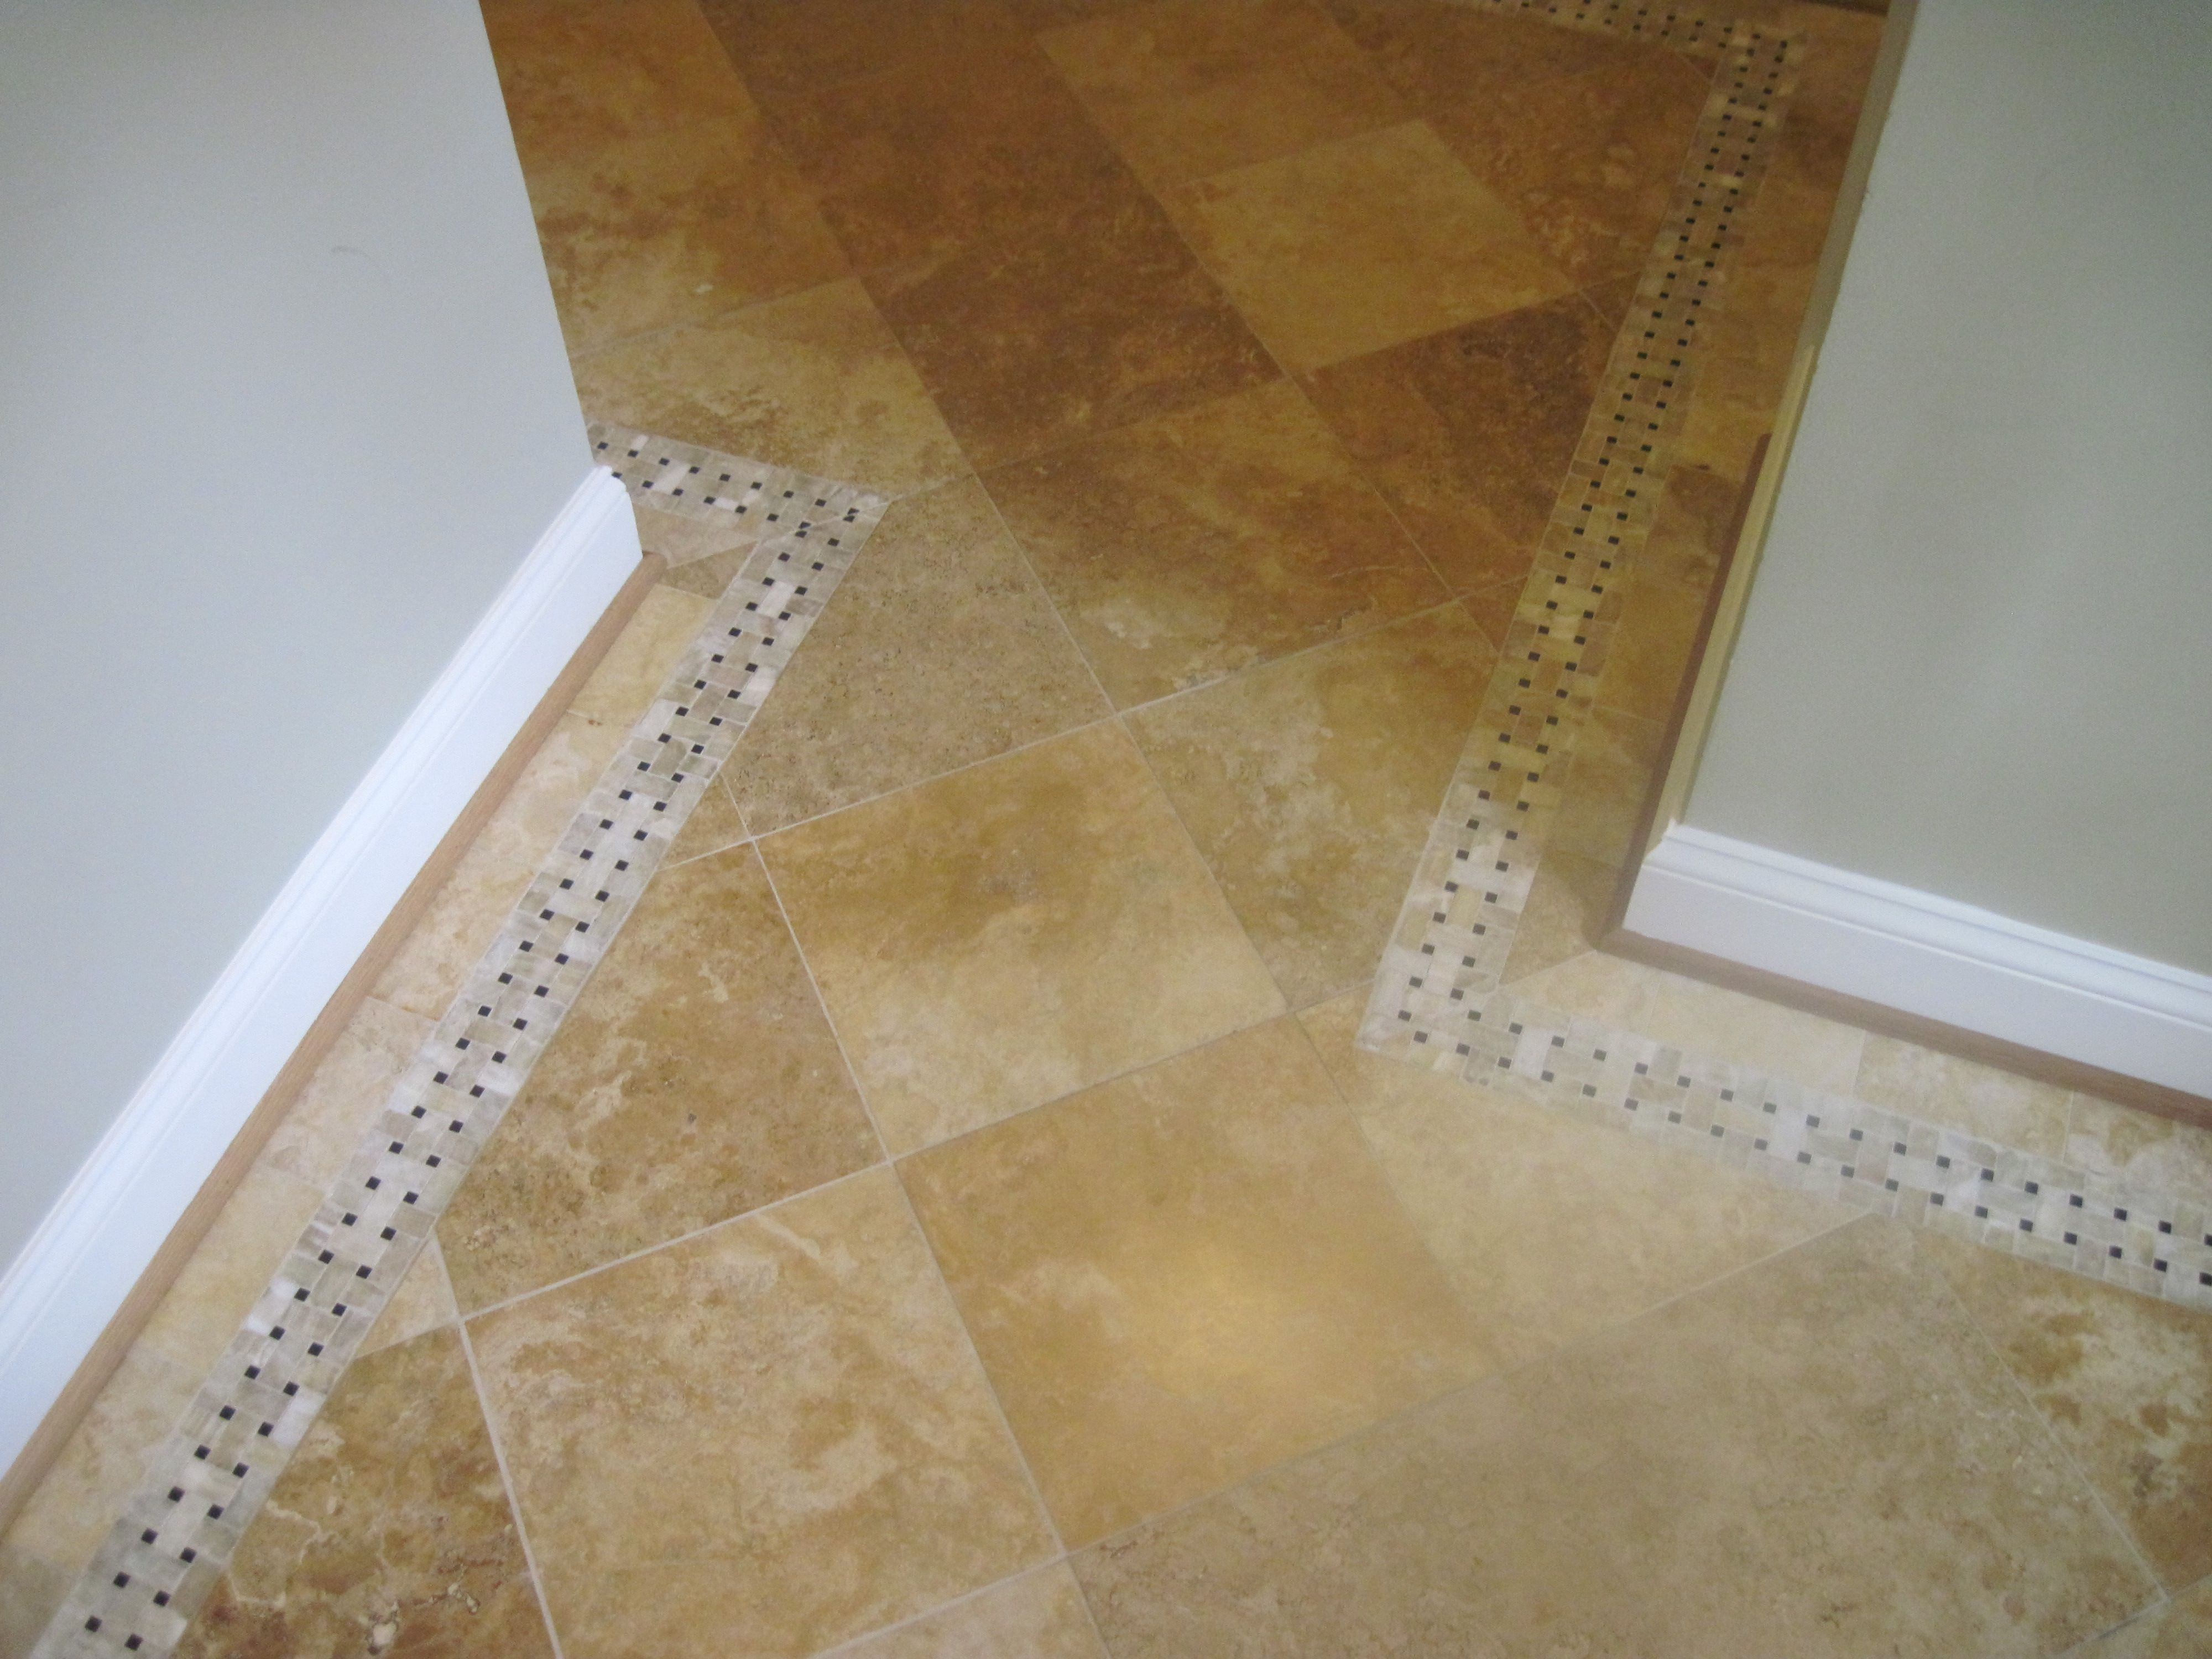 Tilefloorinlayborderg floor boder pinterest bathroom tiling new post bathroom border tiles floor dailygadgetfo Gallery